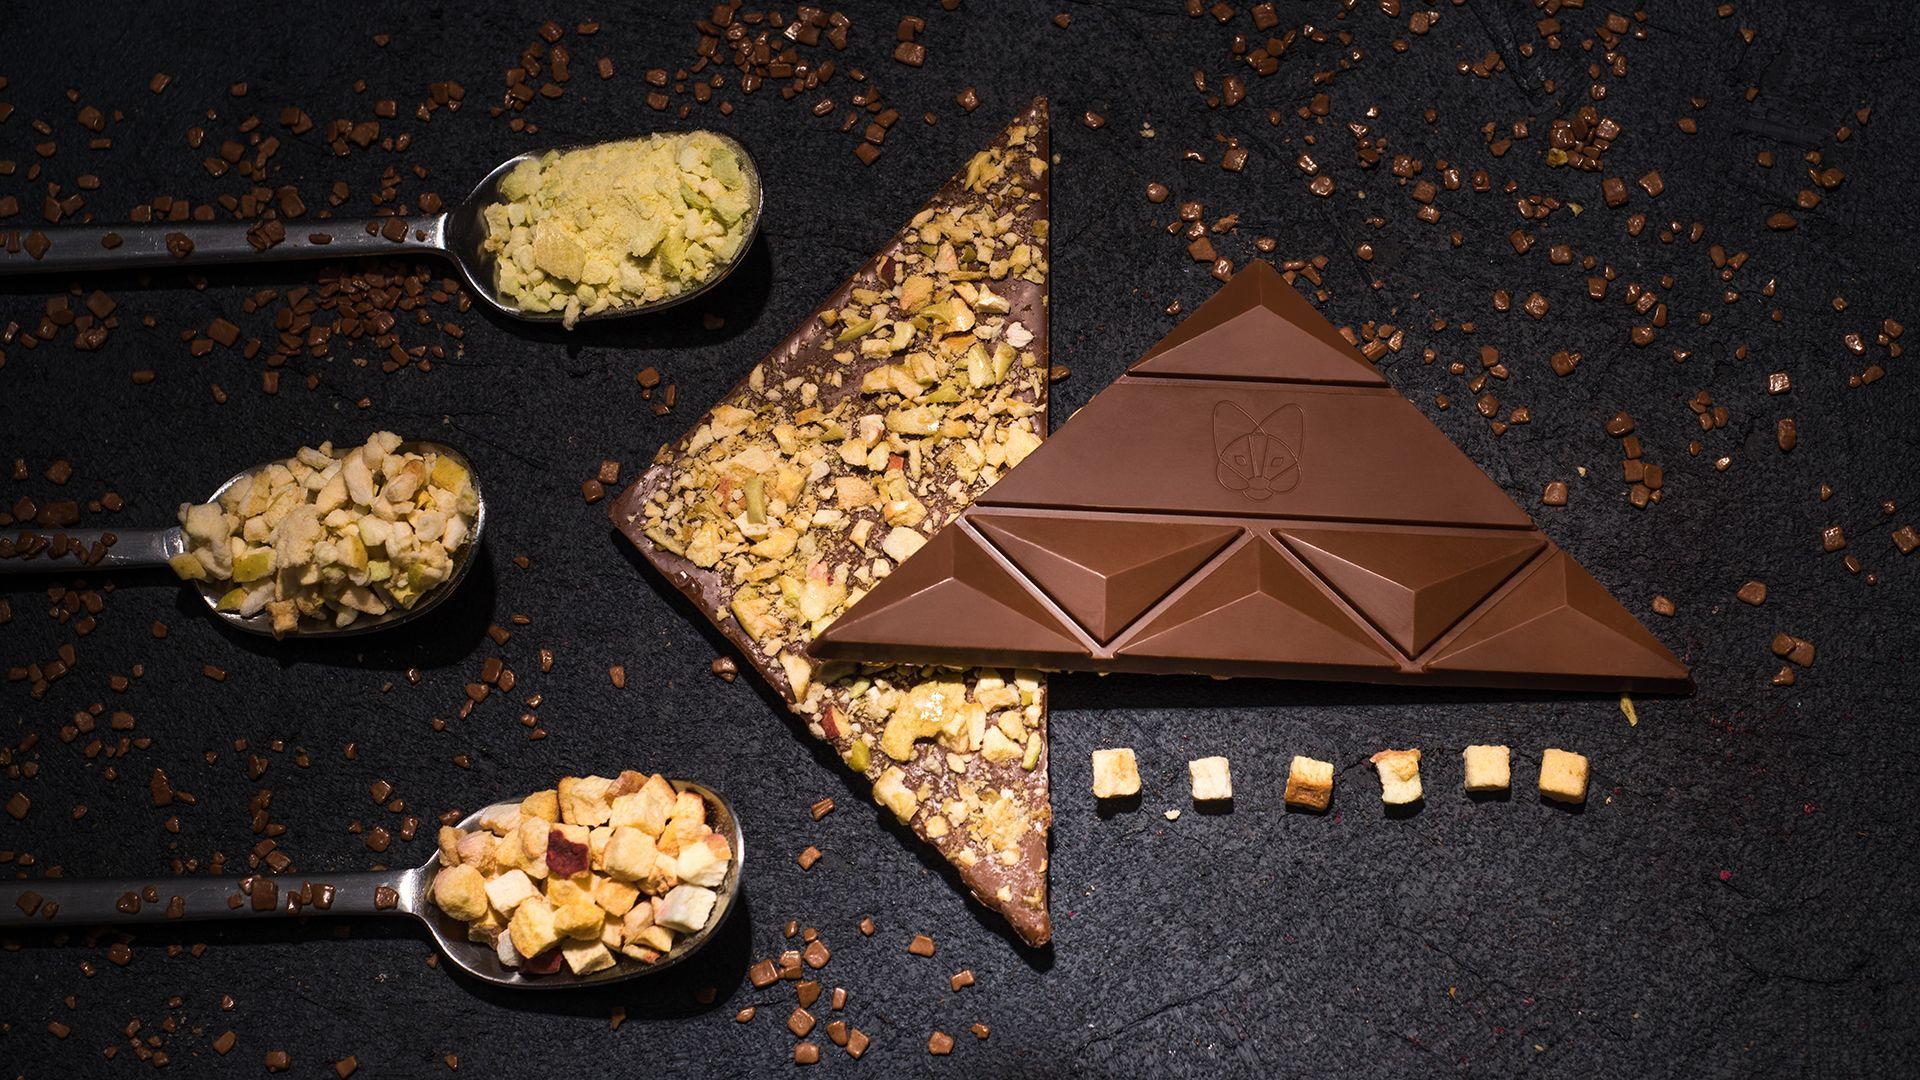 Aguara chocolate dedicated to wine Morava